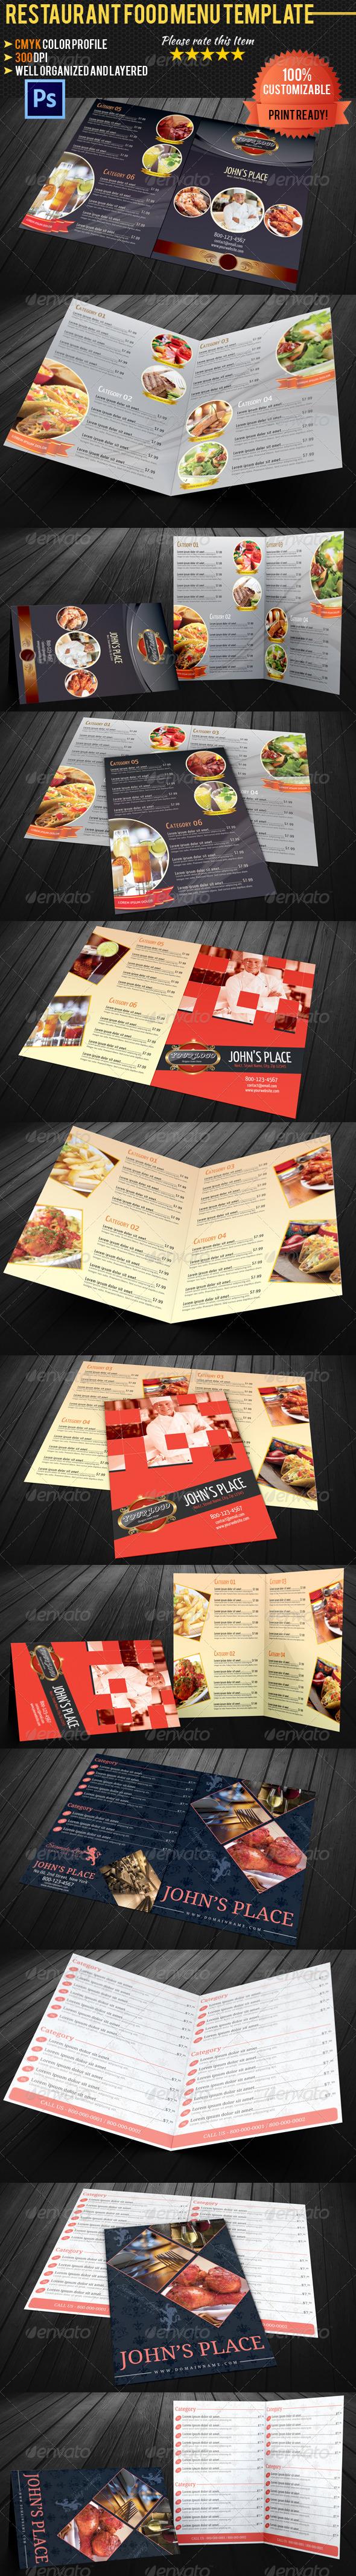 GraphicRiver Bi-fold Restaurant Food Menu Template Bundle 4960528